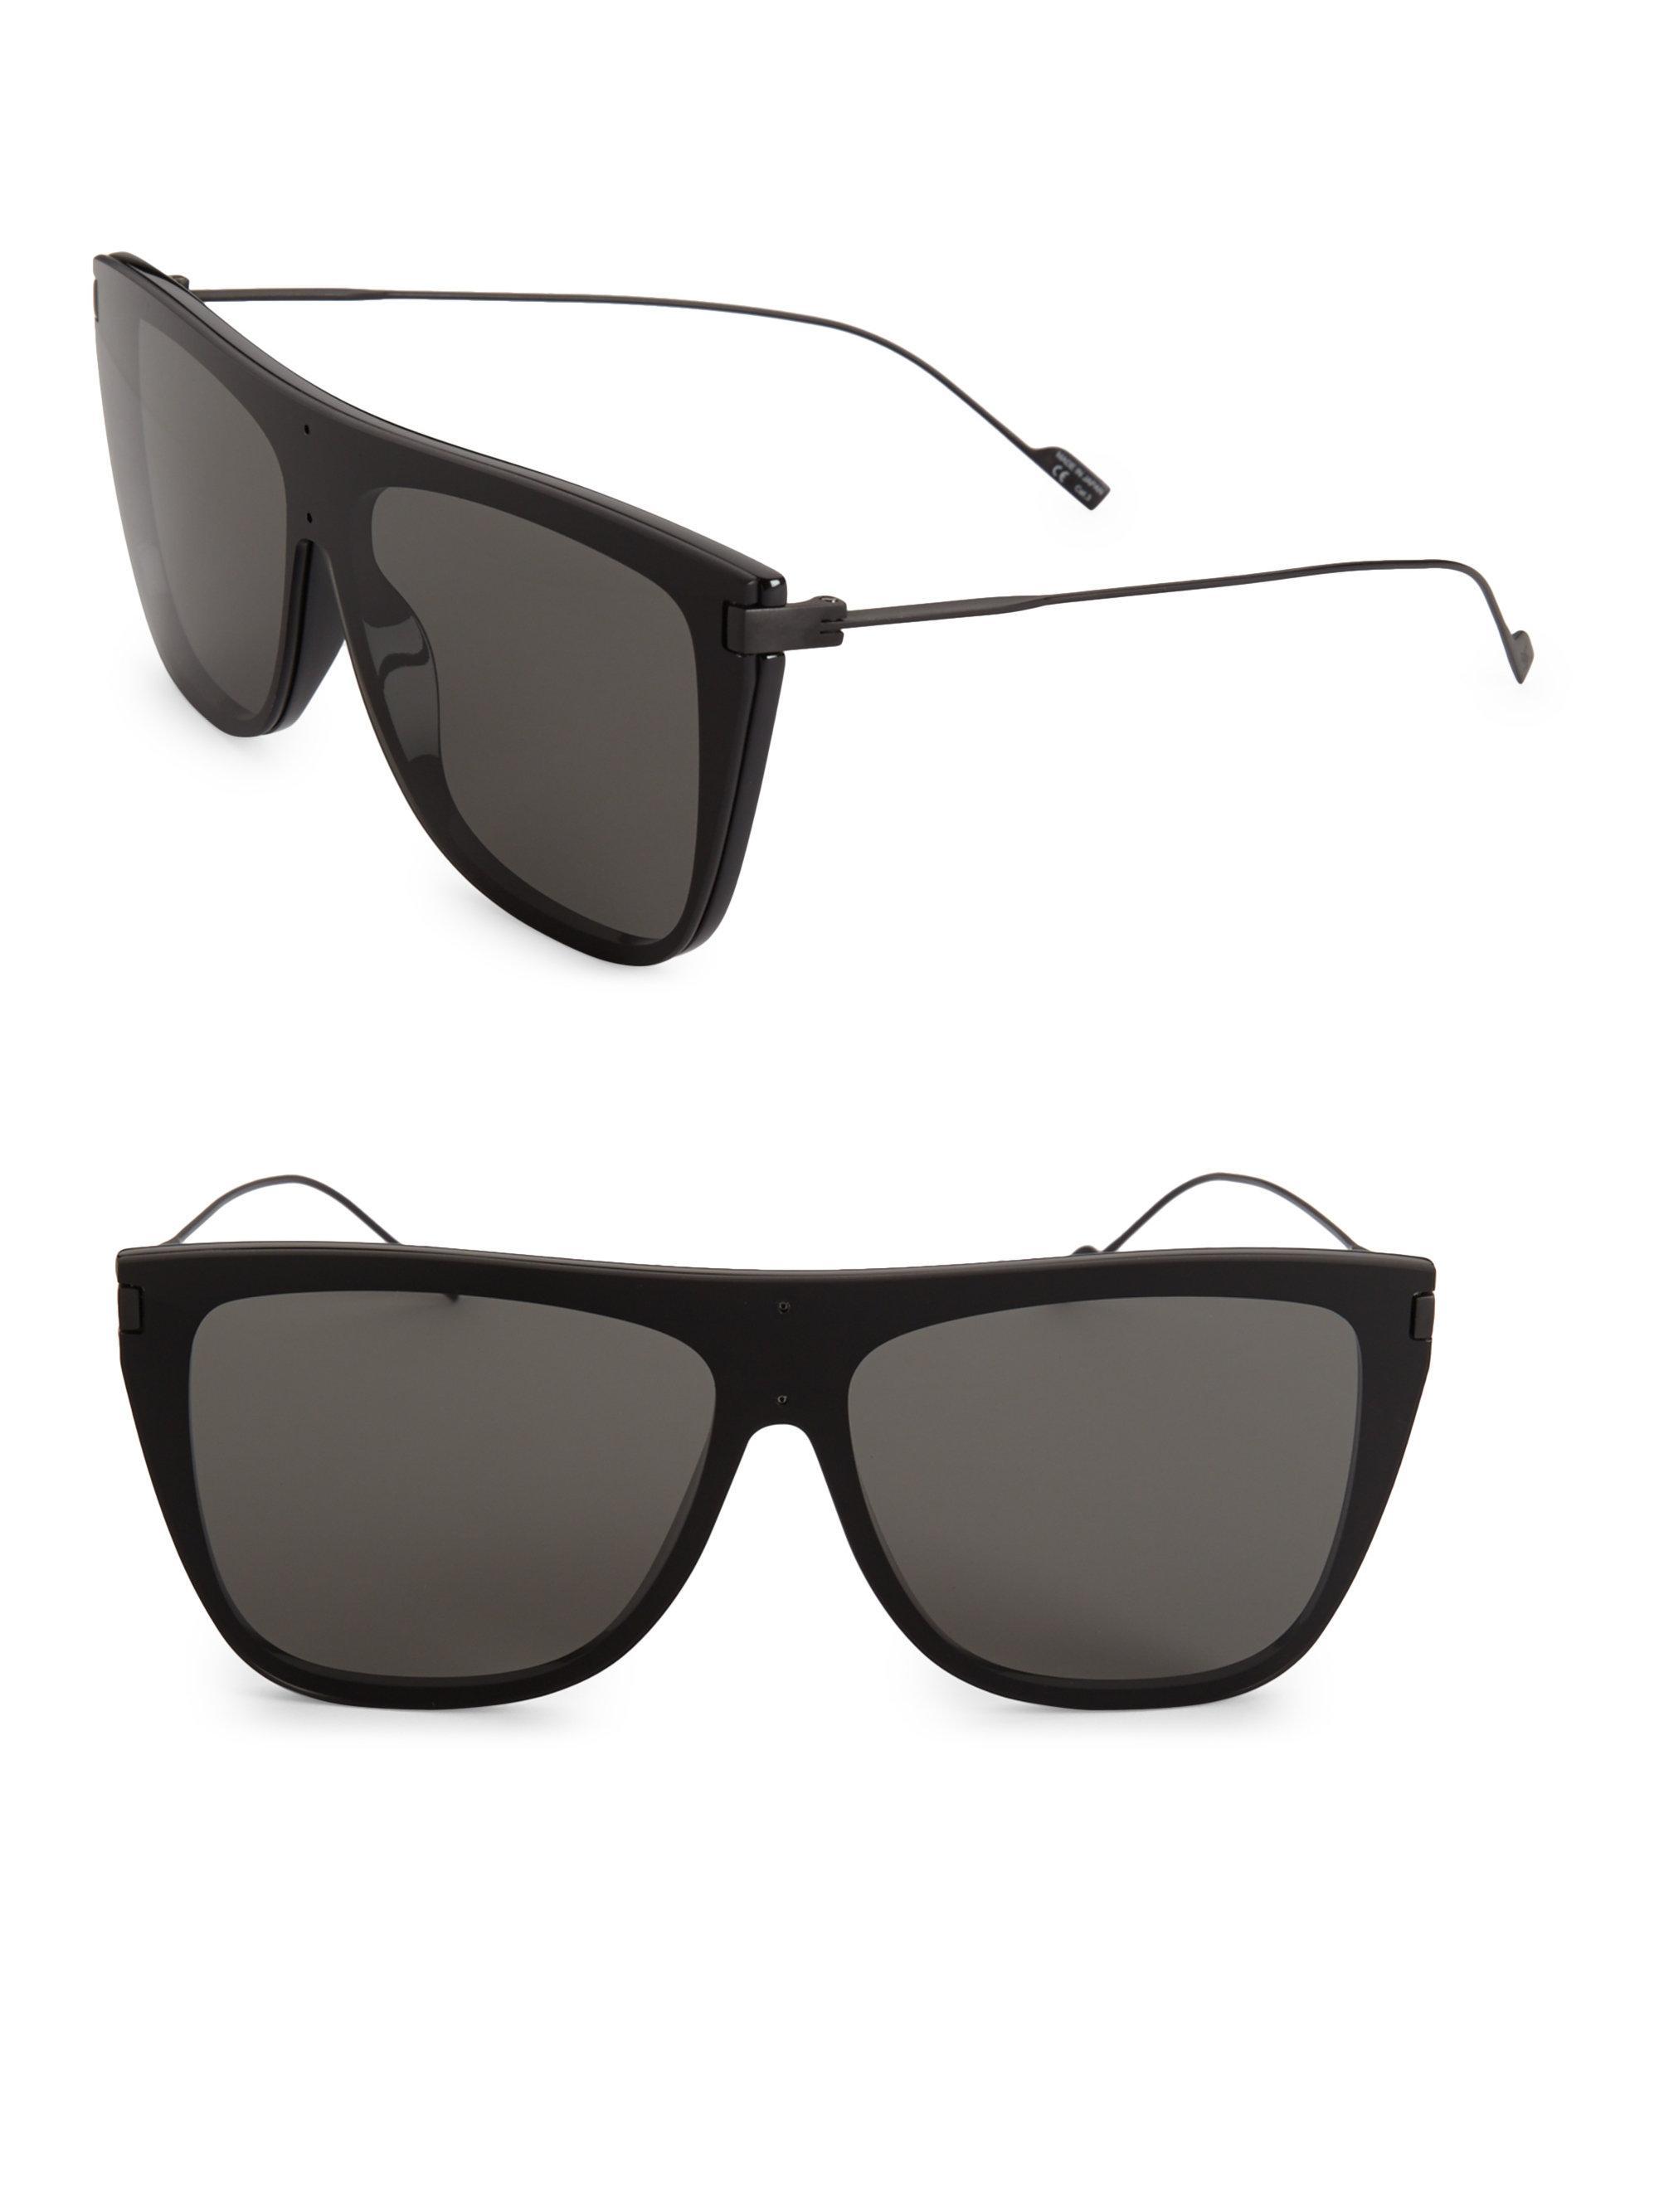 7c25ec66371 Saint Laurent 99mm Square Frame Sunglasses in Black for Men - Lyst